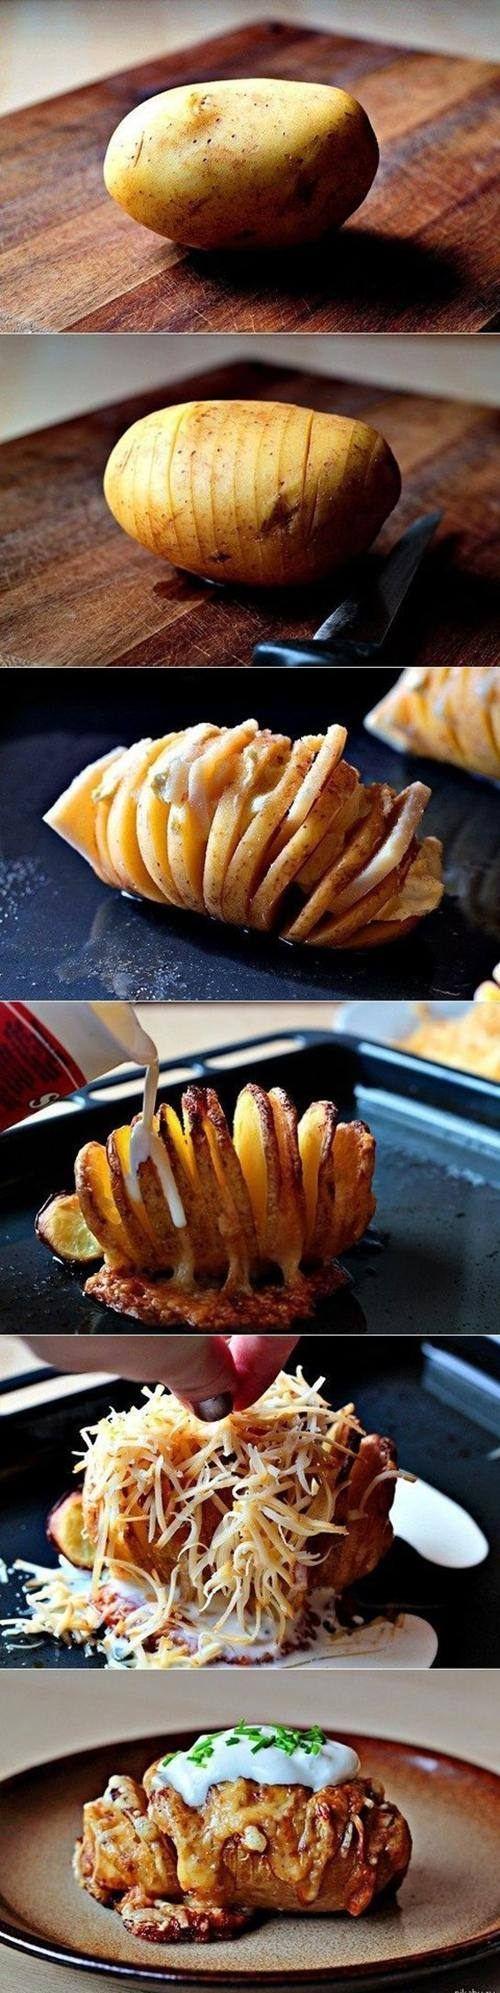 Baked Potato w. Cheese  Best potato ever!